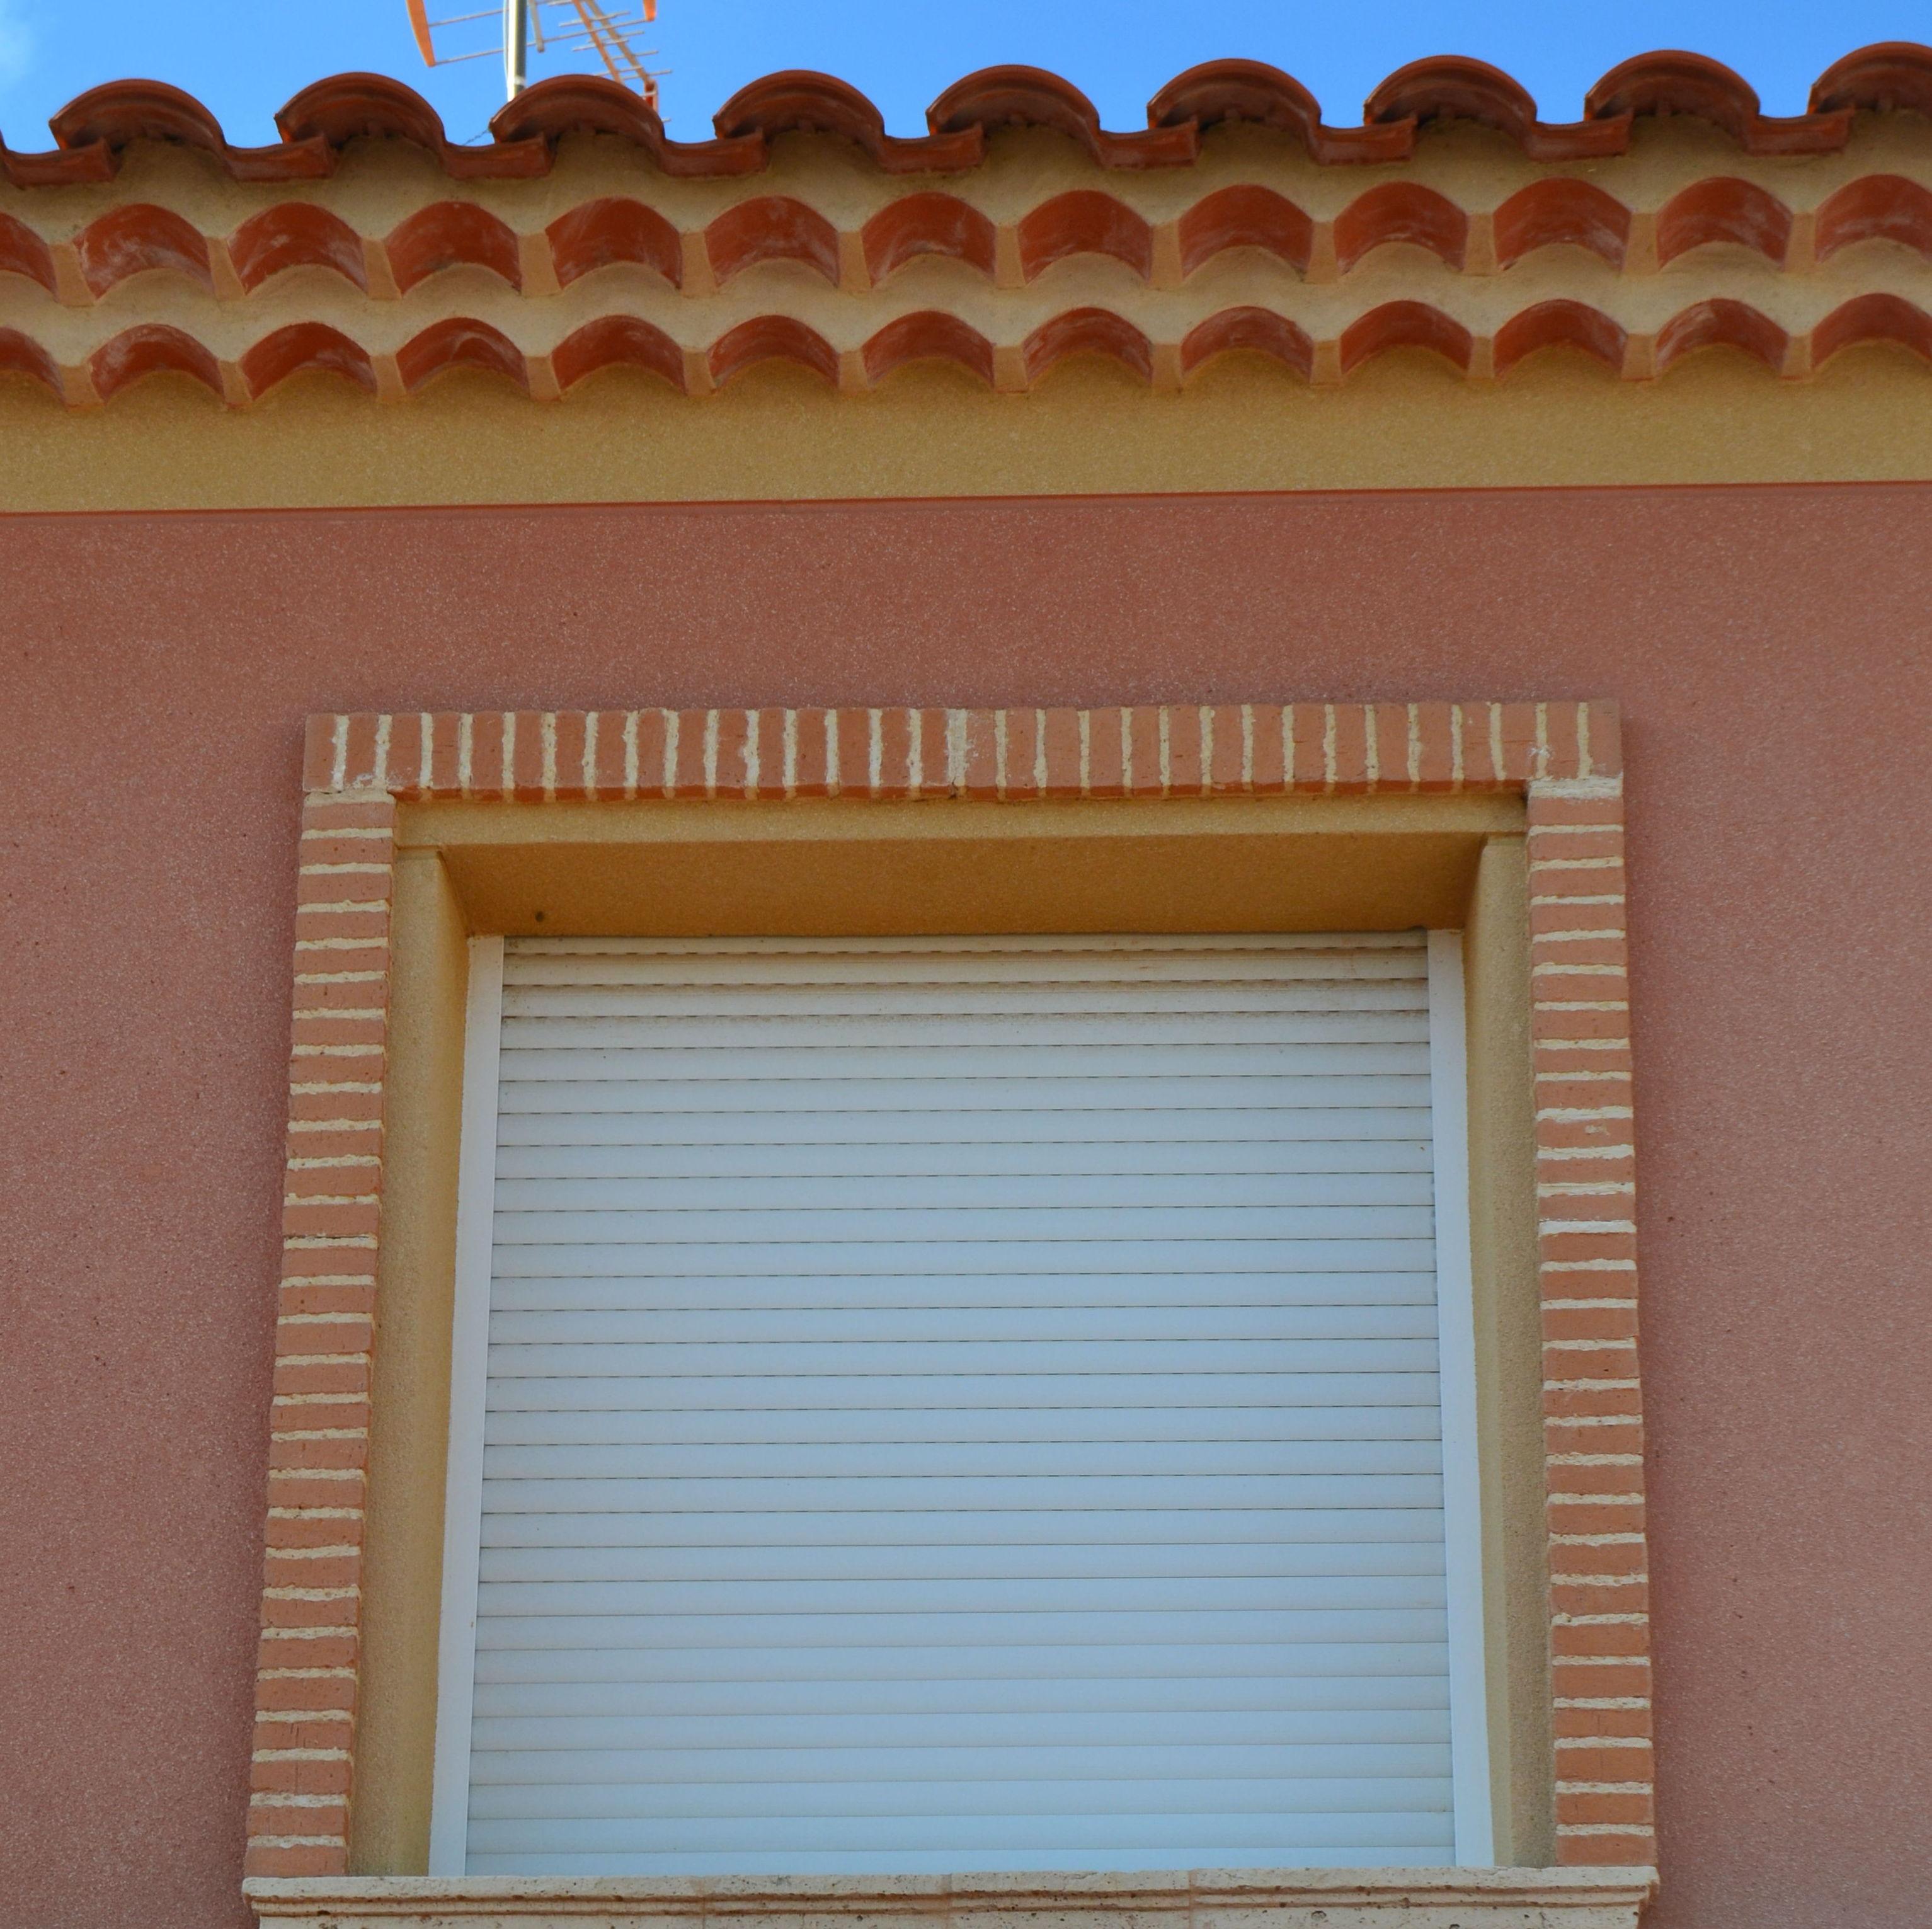 Hormigón para fachadas